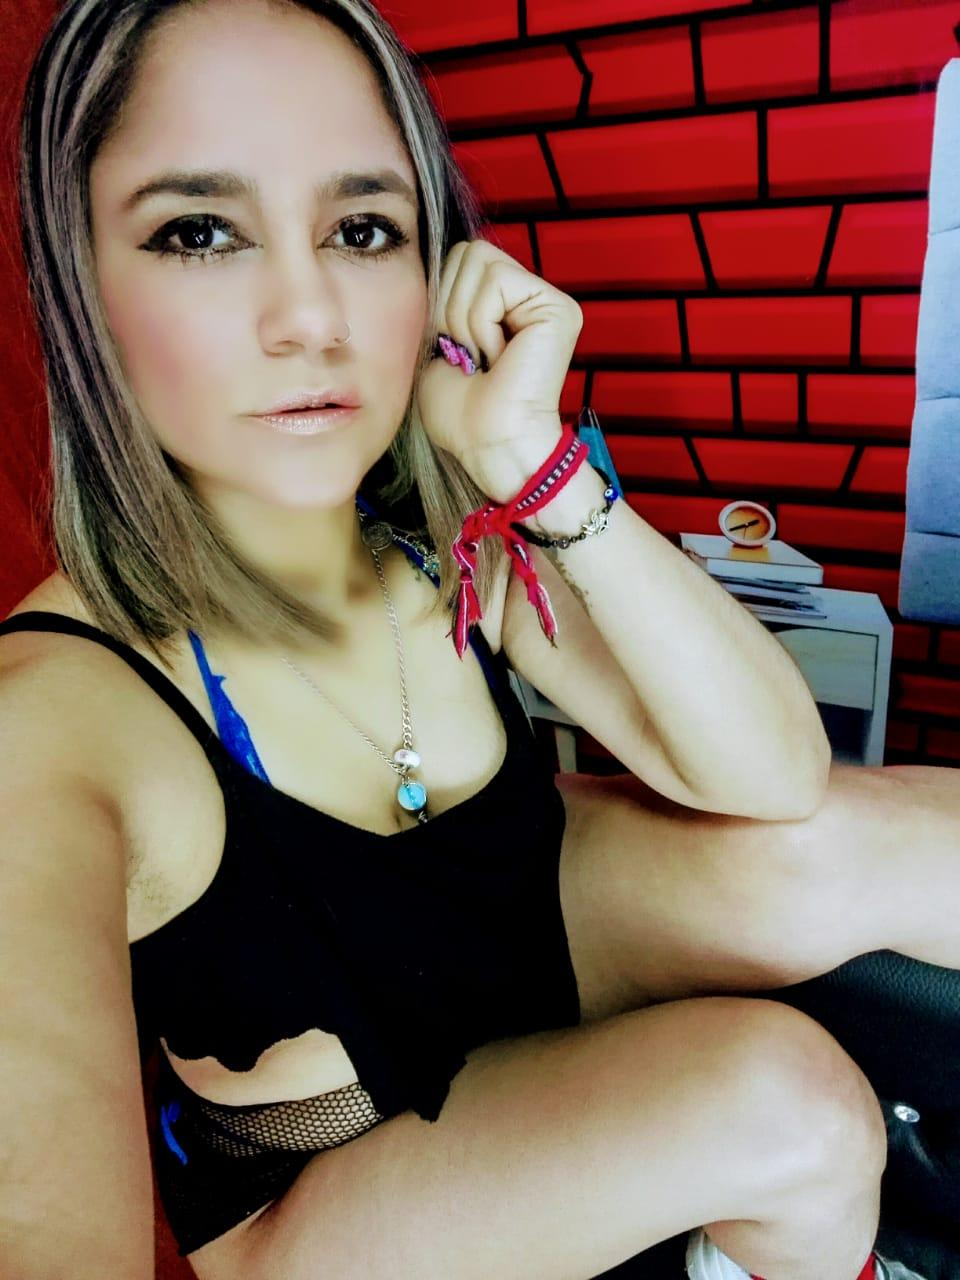 Camila rivero?s=4yn7xh0vvn0znkctfaoislo1tw9i5so7b6oz04whm1s=